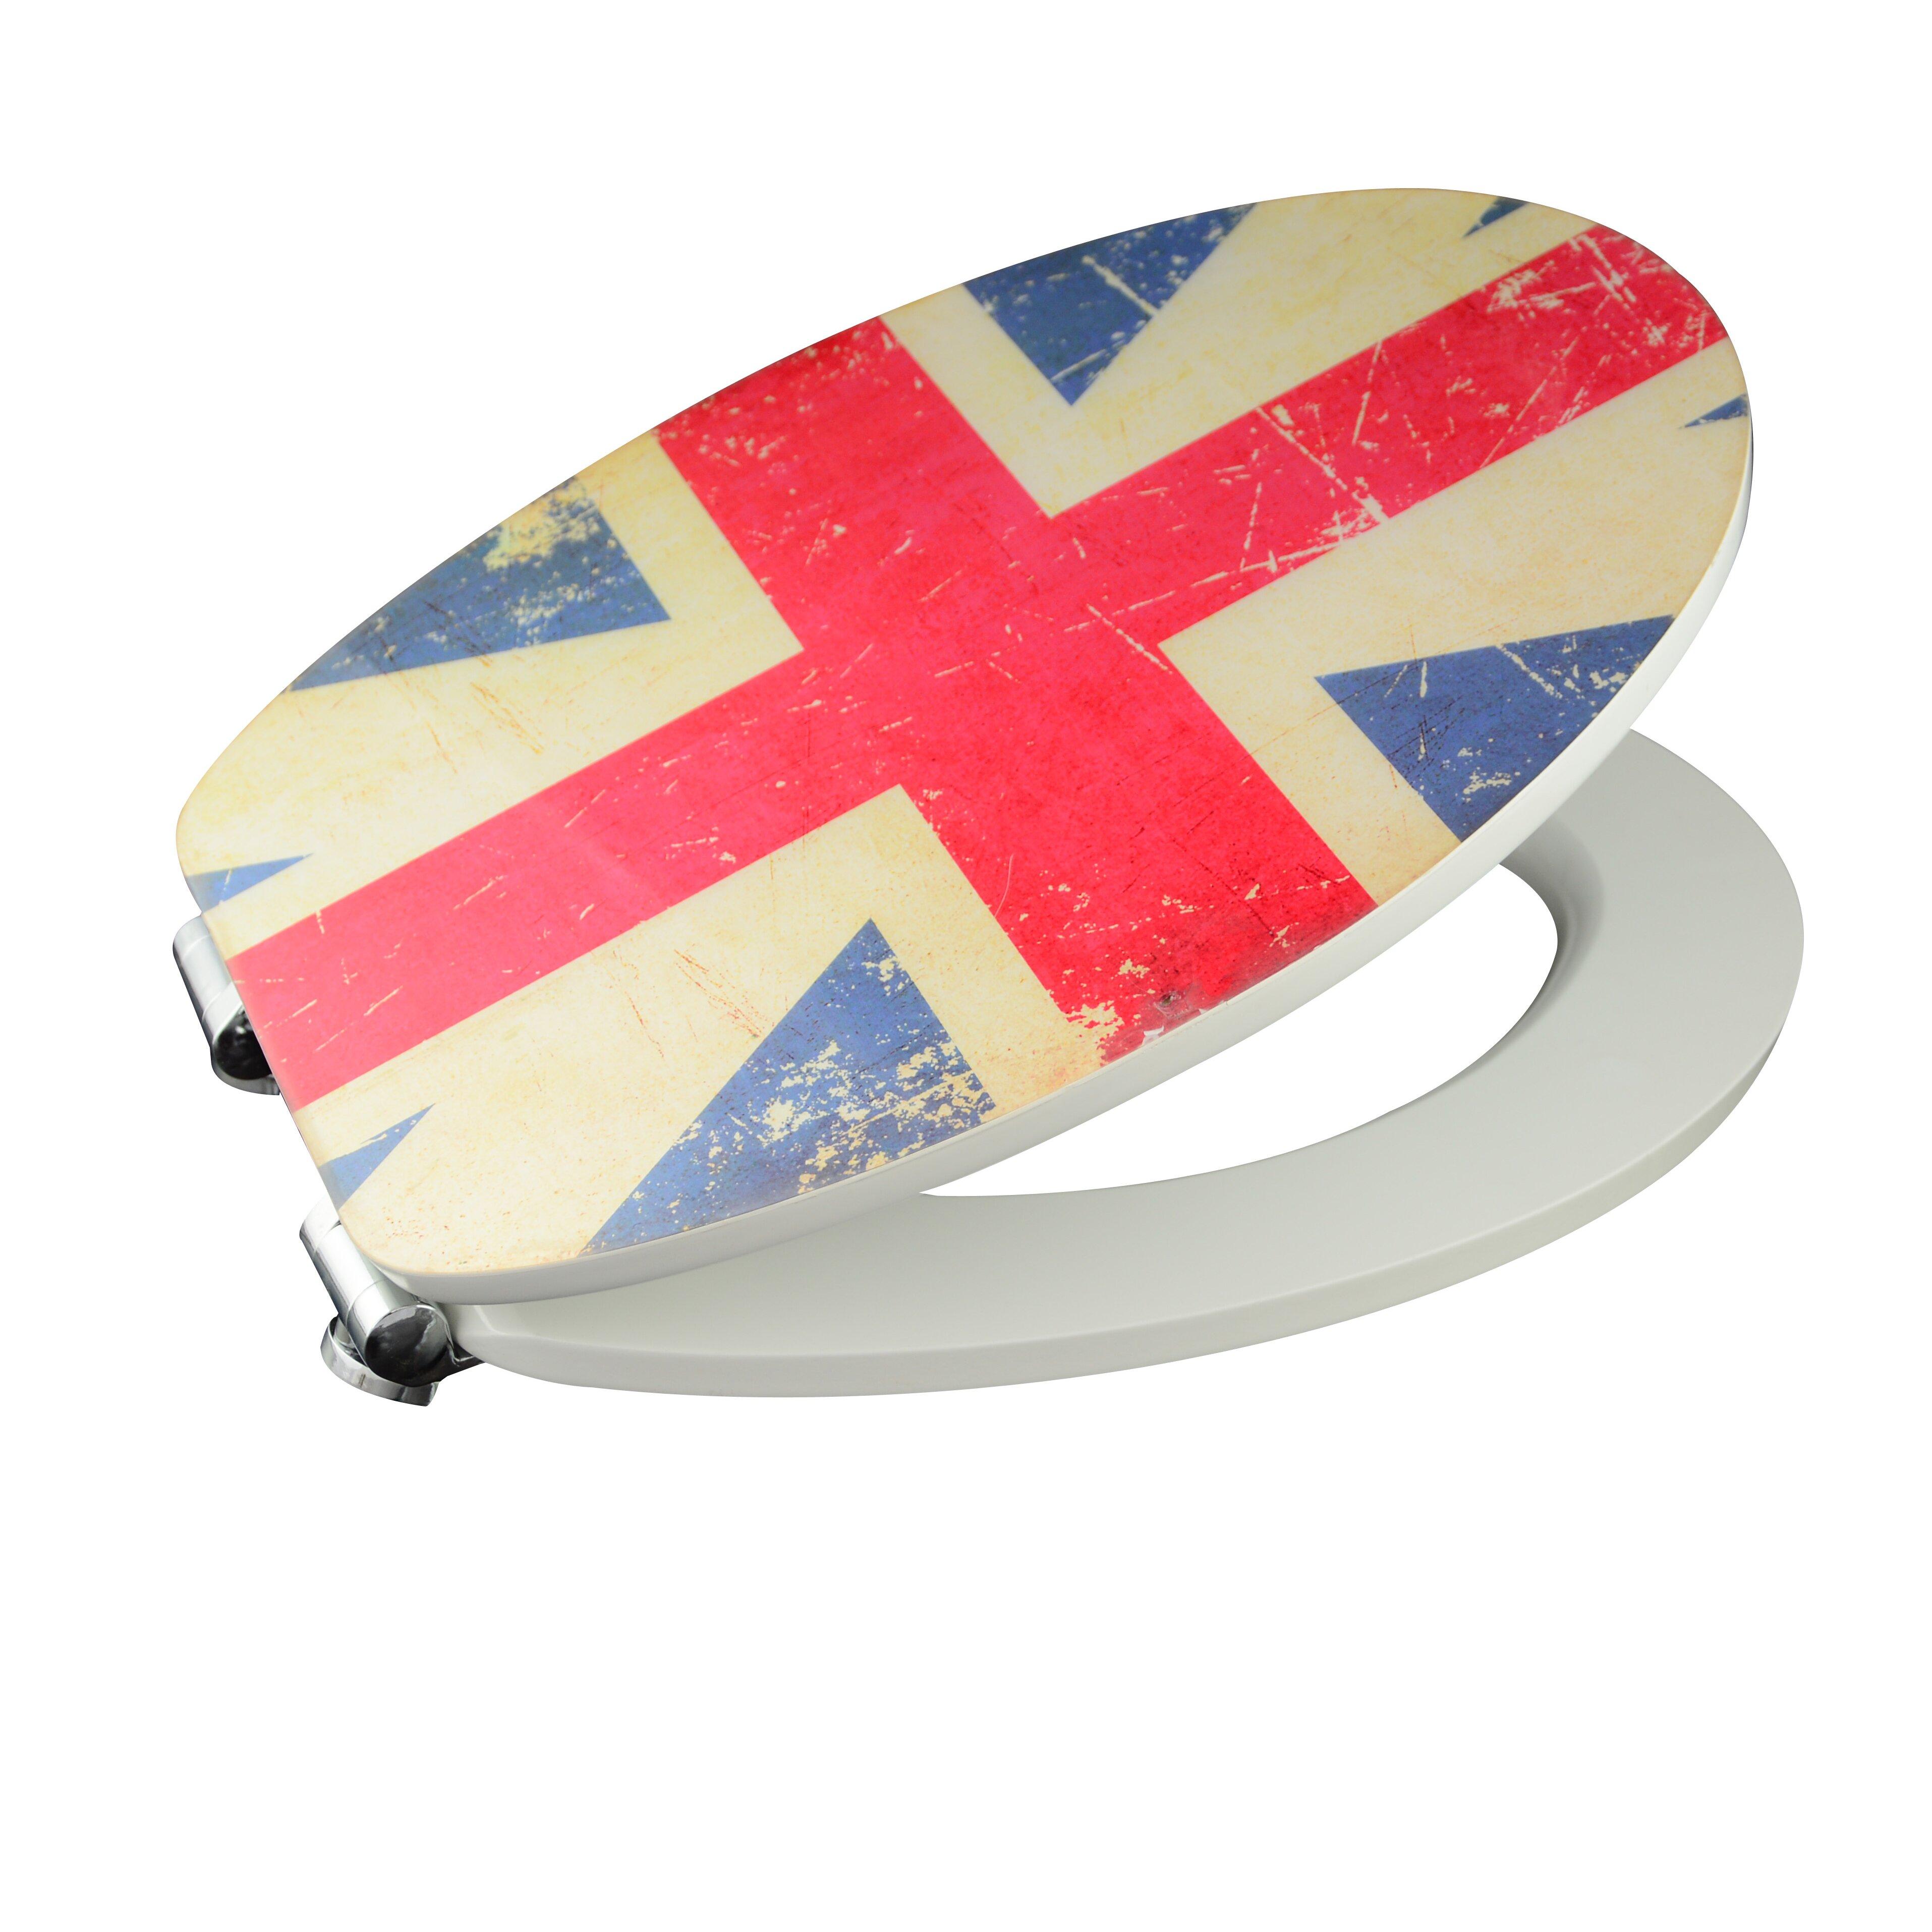 Eisl Union Jack Toilet Seat Sticker Reviews Wayfair UK